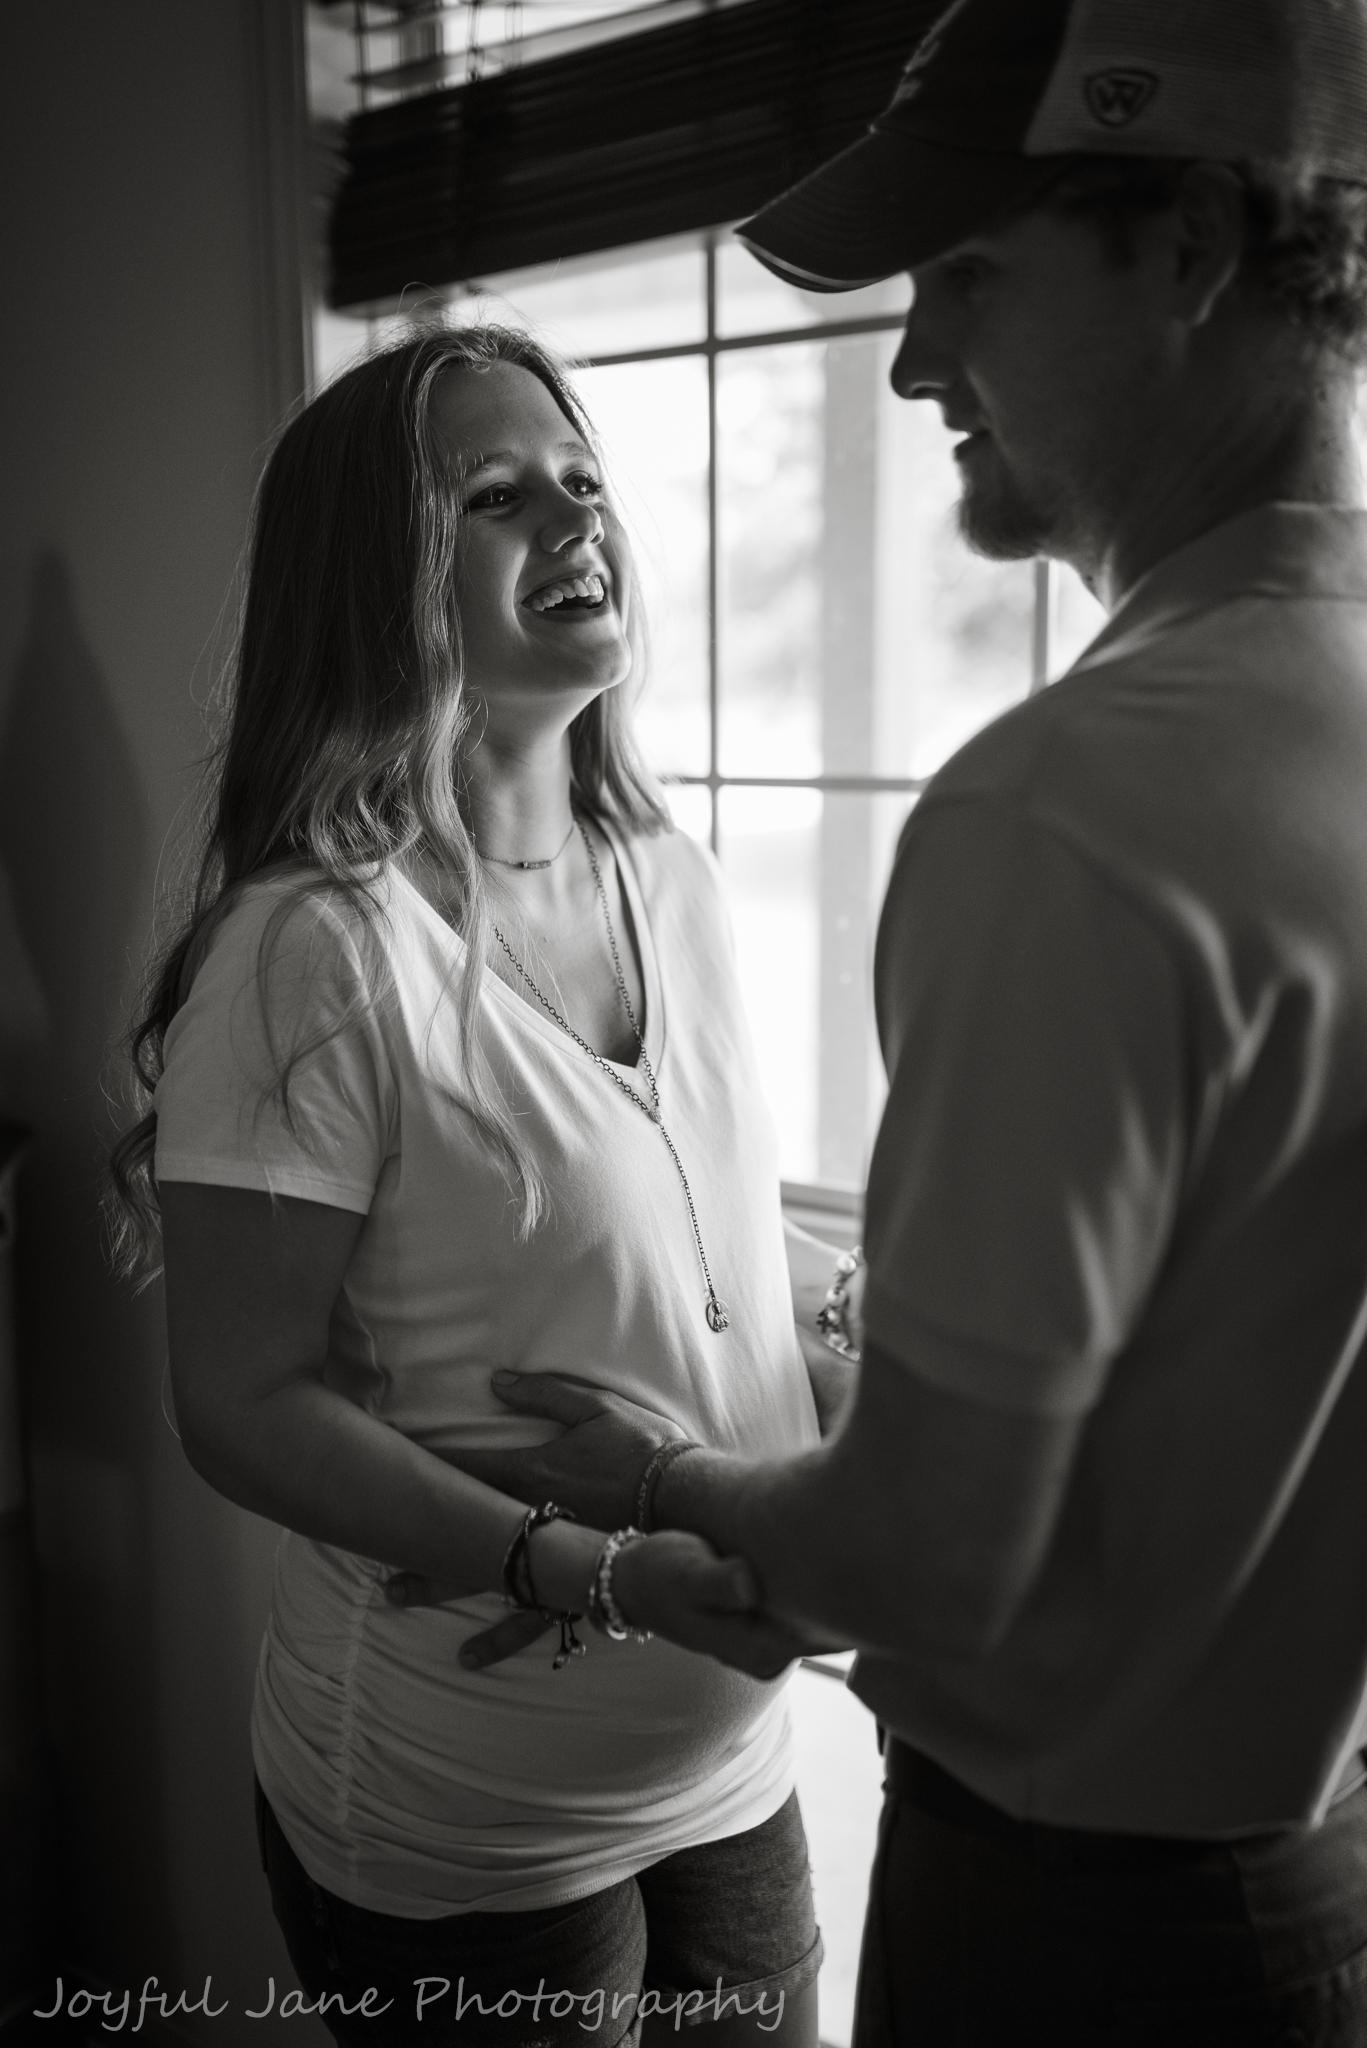 Louisiana In-home maternity photography | Joyful Jane Photography